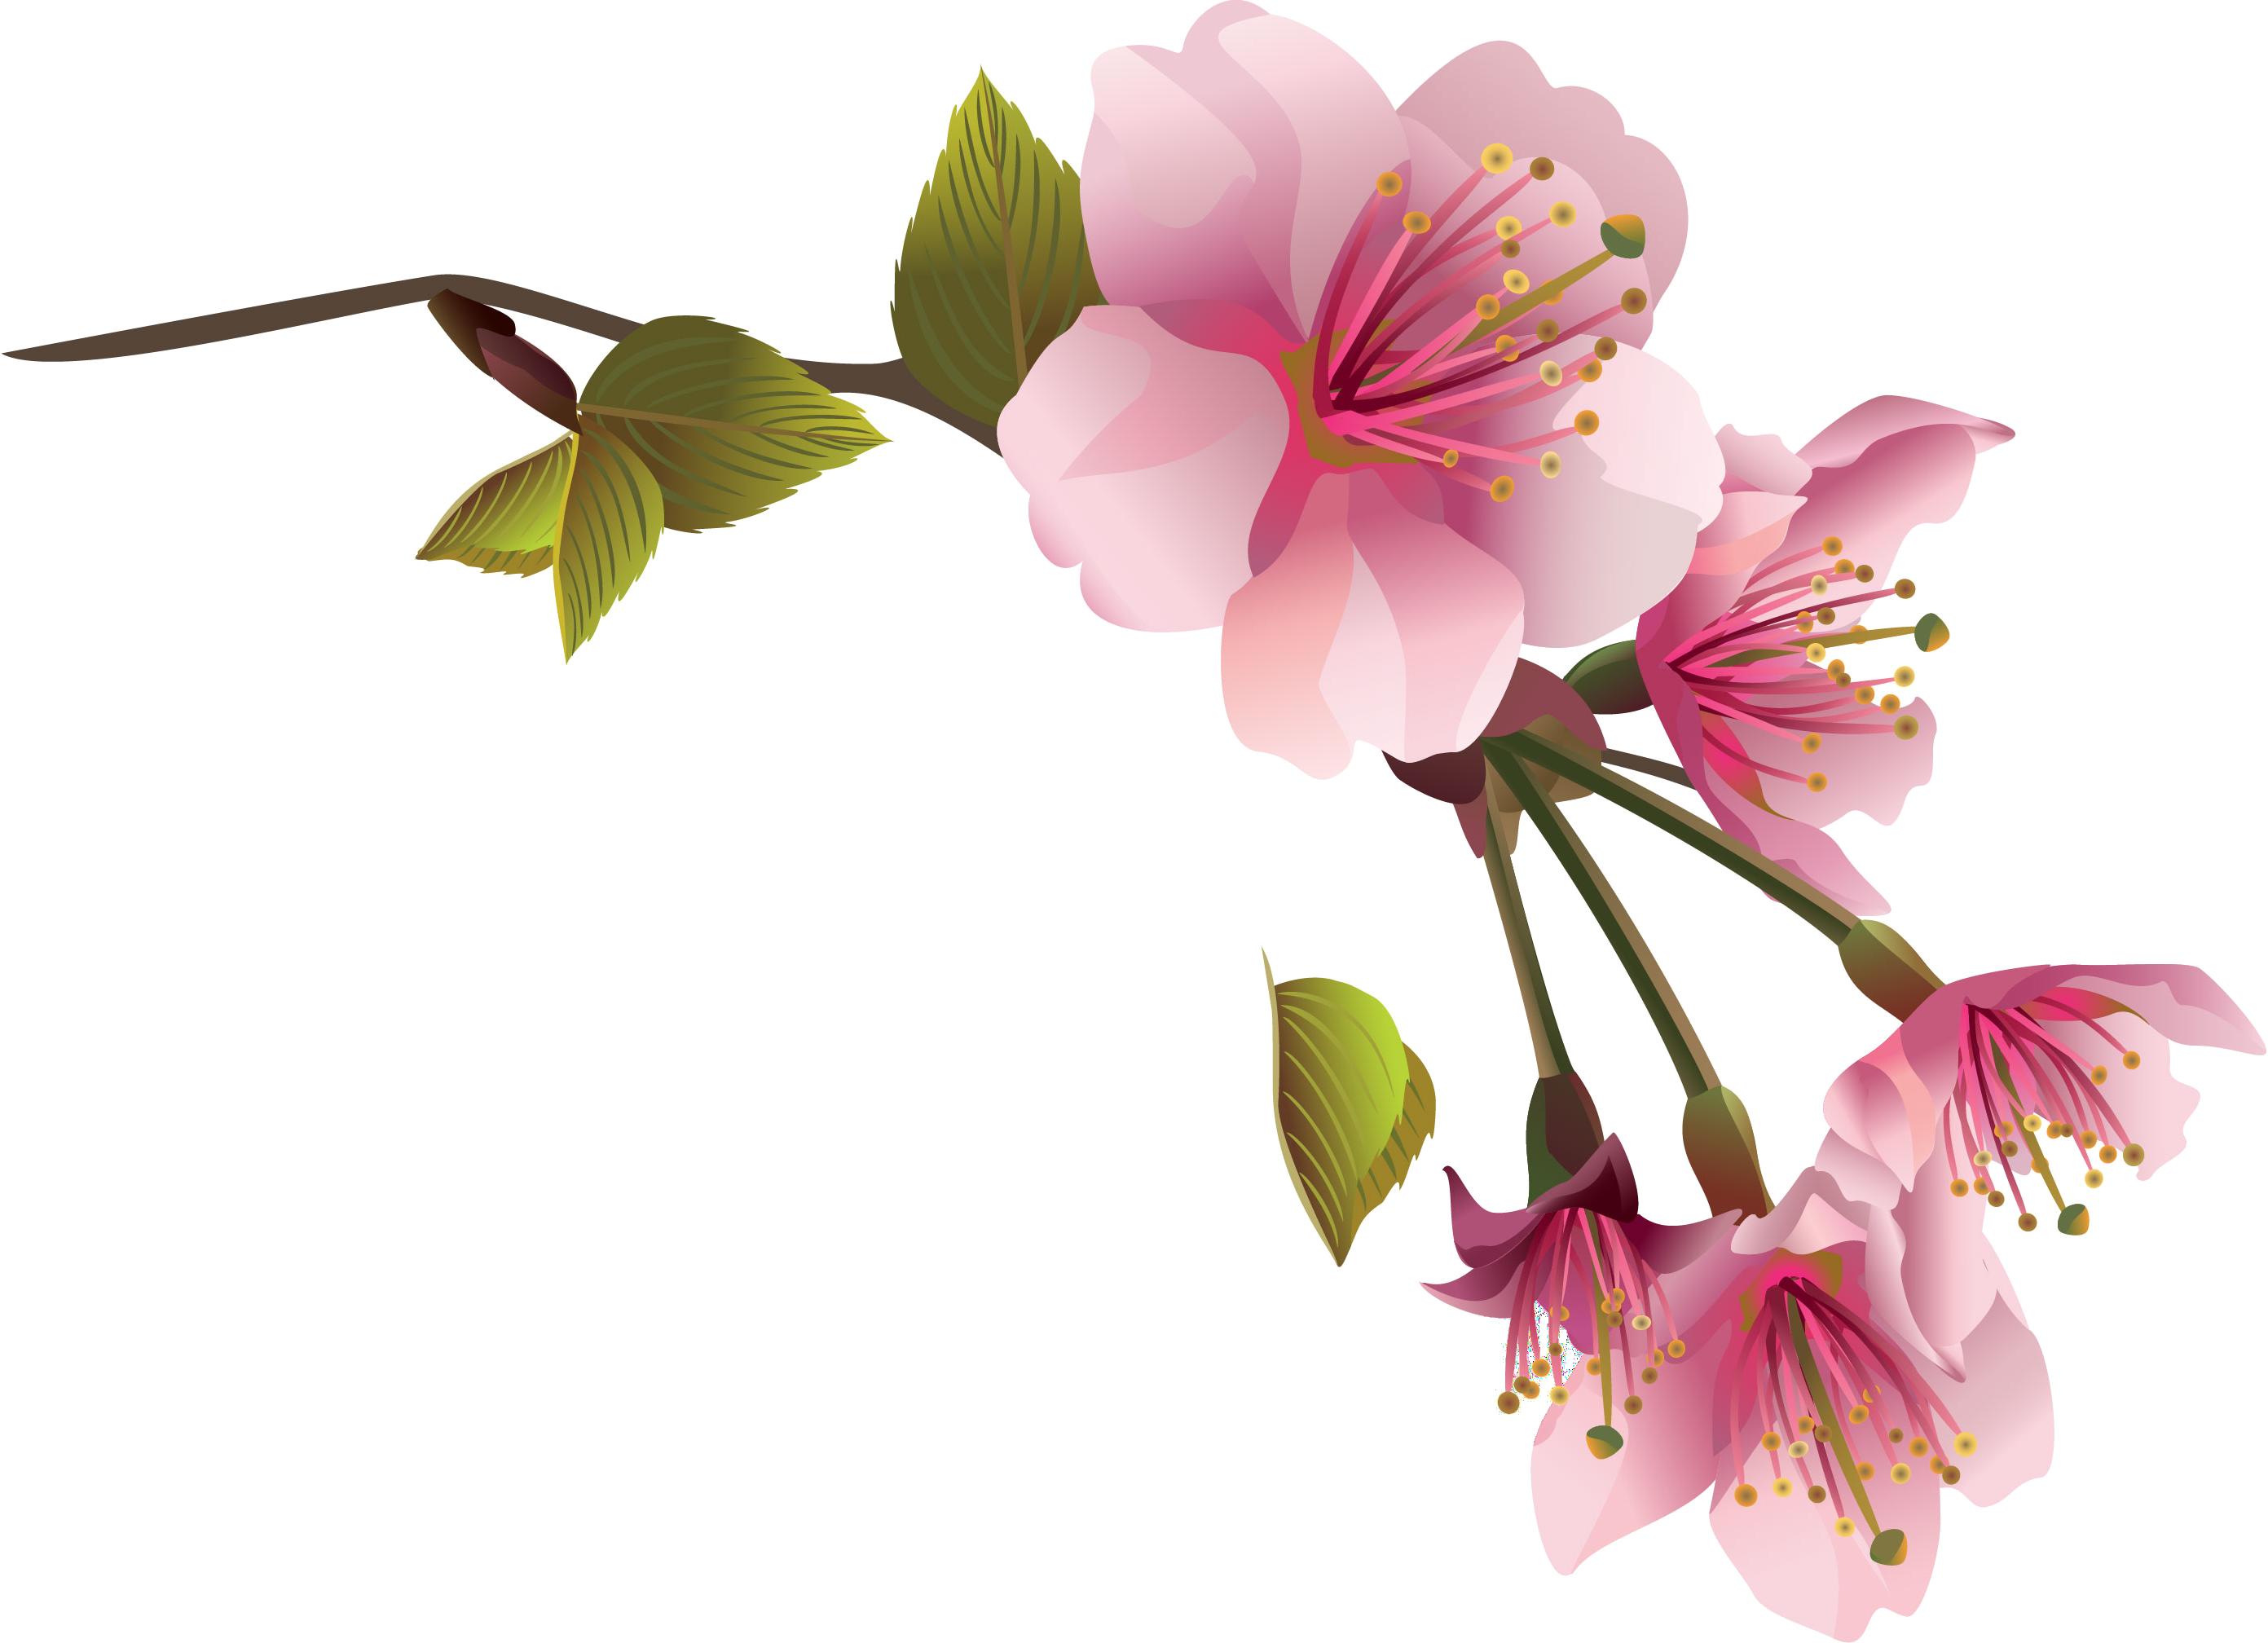 Magnolia Clipart Branch Magnolia Branch Transparent Free